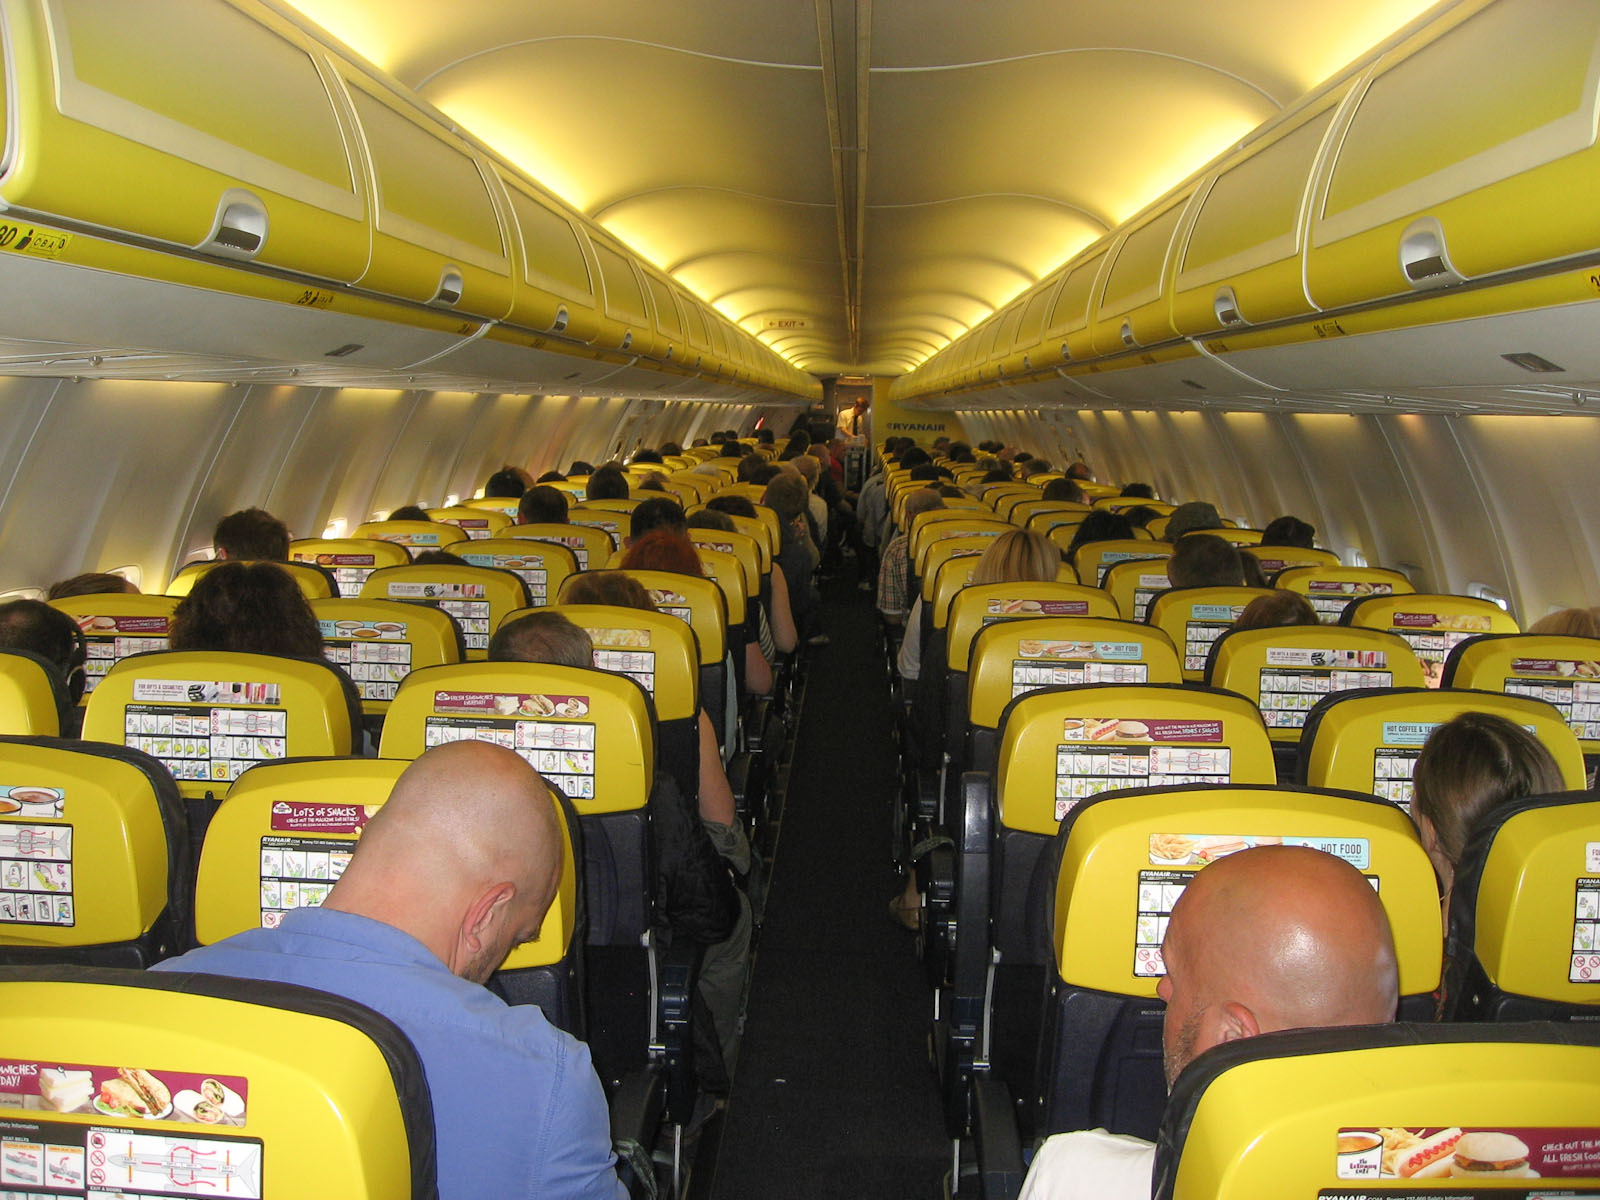 Картинки по запросу фото салон самолёта Руанайр